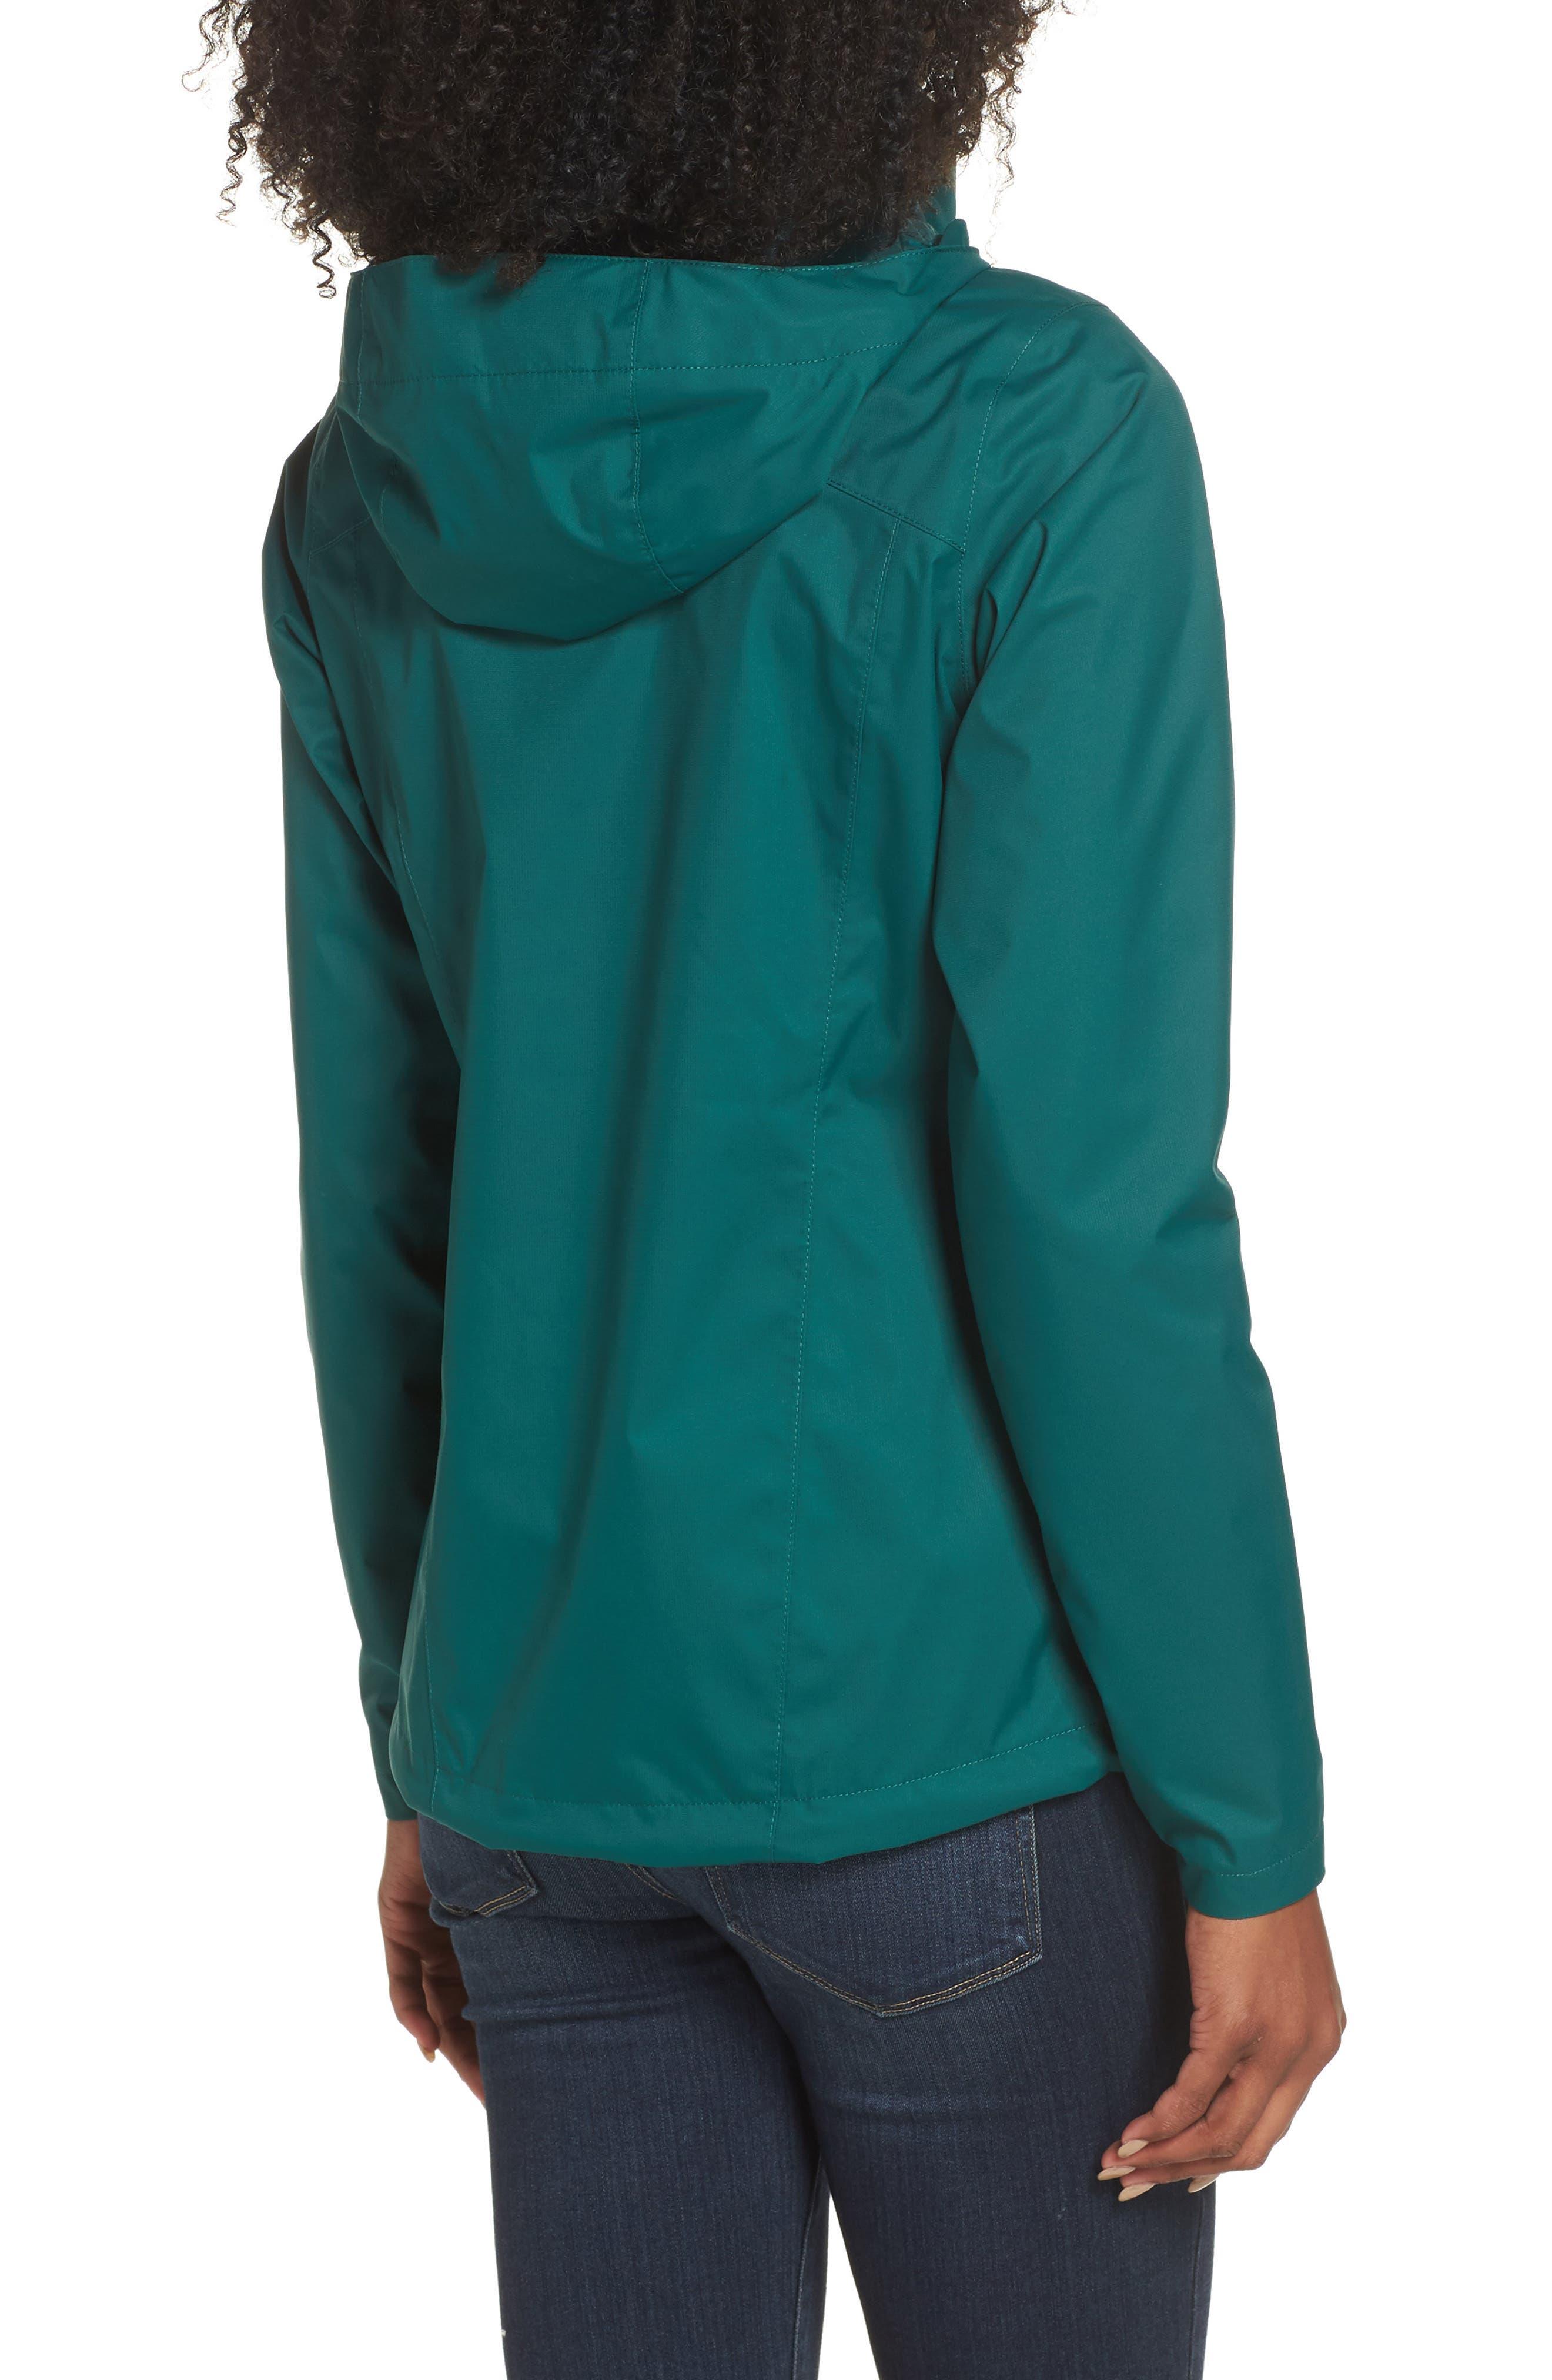 Resolve Plus Waterproof Jacket,                             Alternate thumbnail 2, color,                             BOTANICAL GREEN